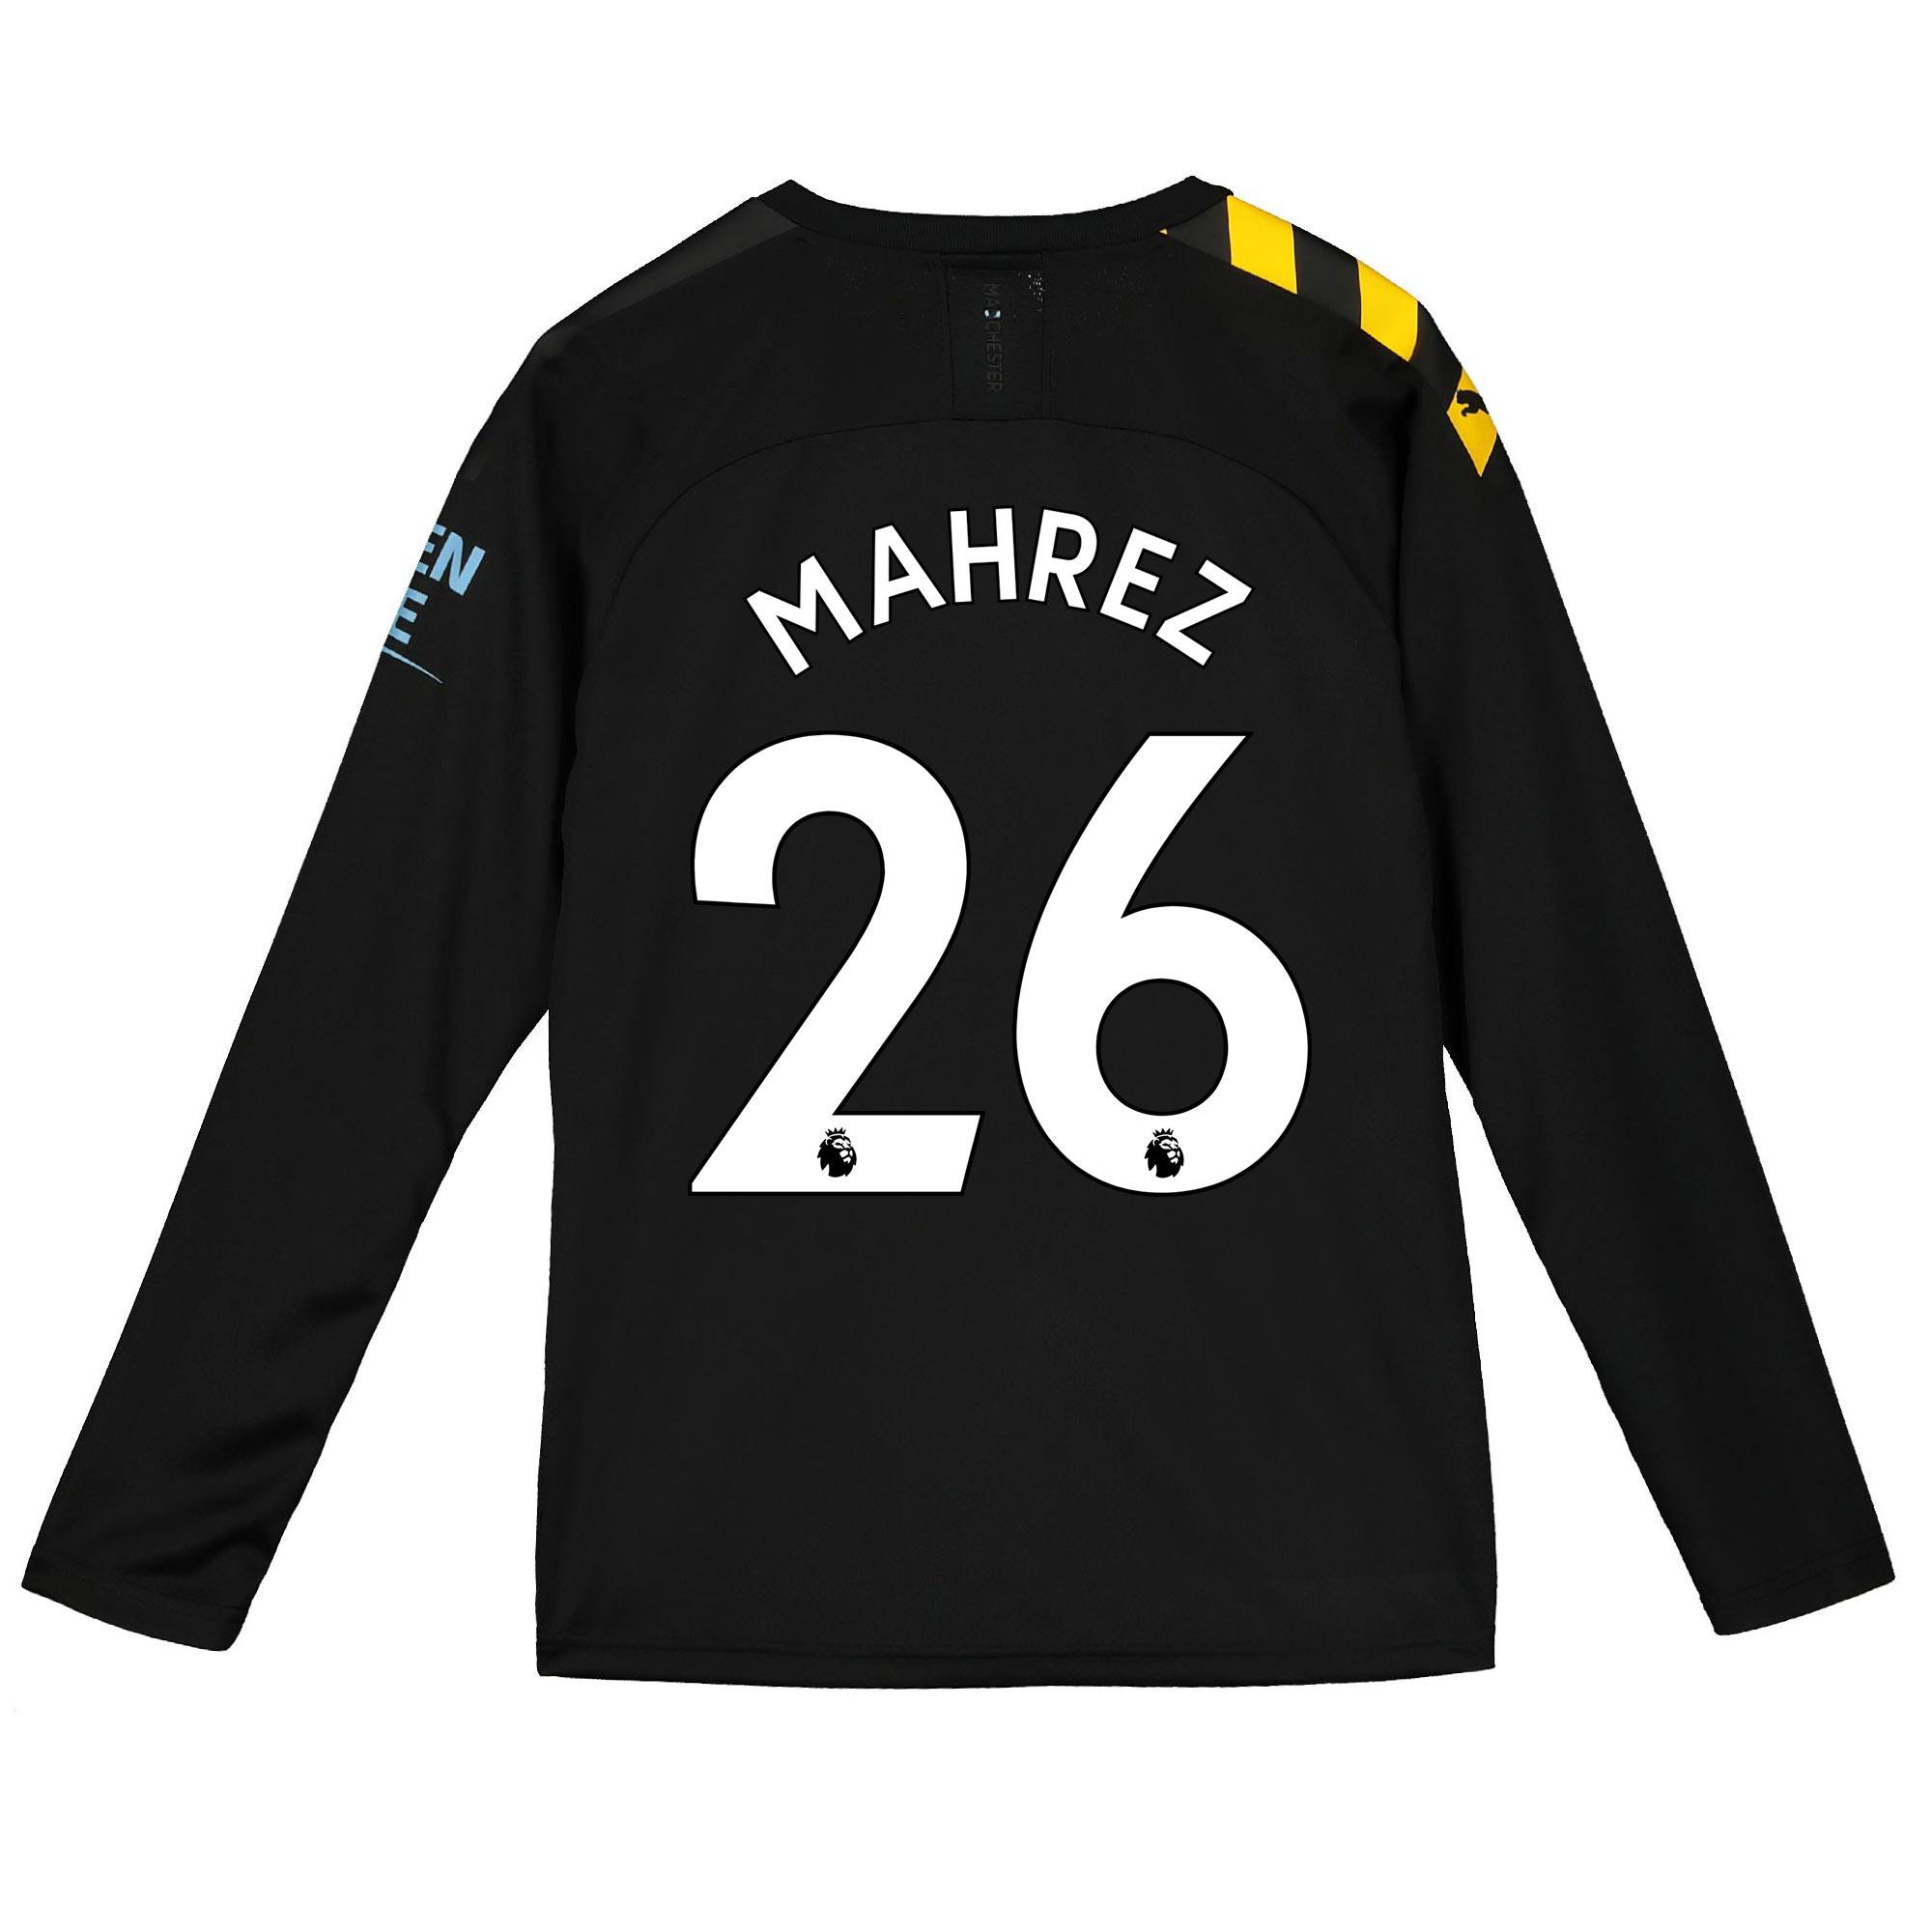 Camiseta de manga larga de la 2.ª equipación del Manchester City 2019-20 para niños dorsal Mahrez 26